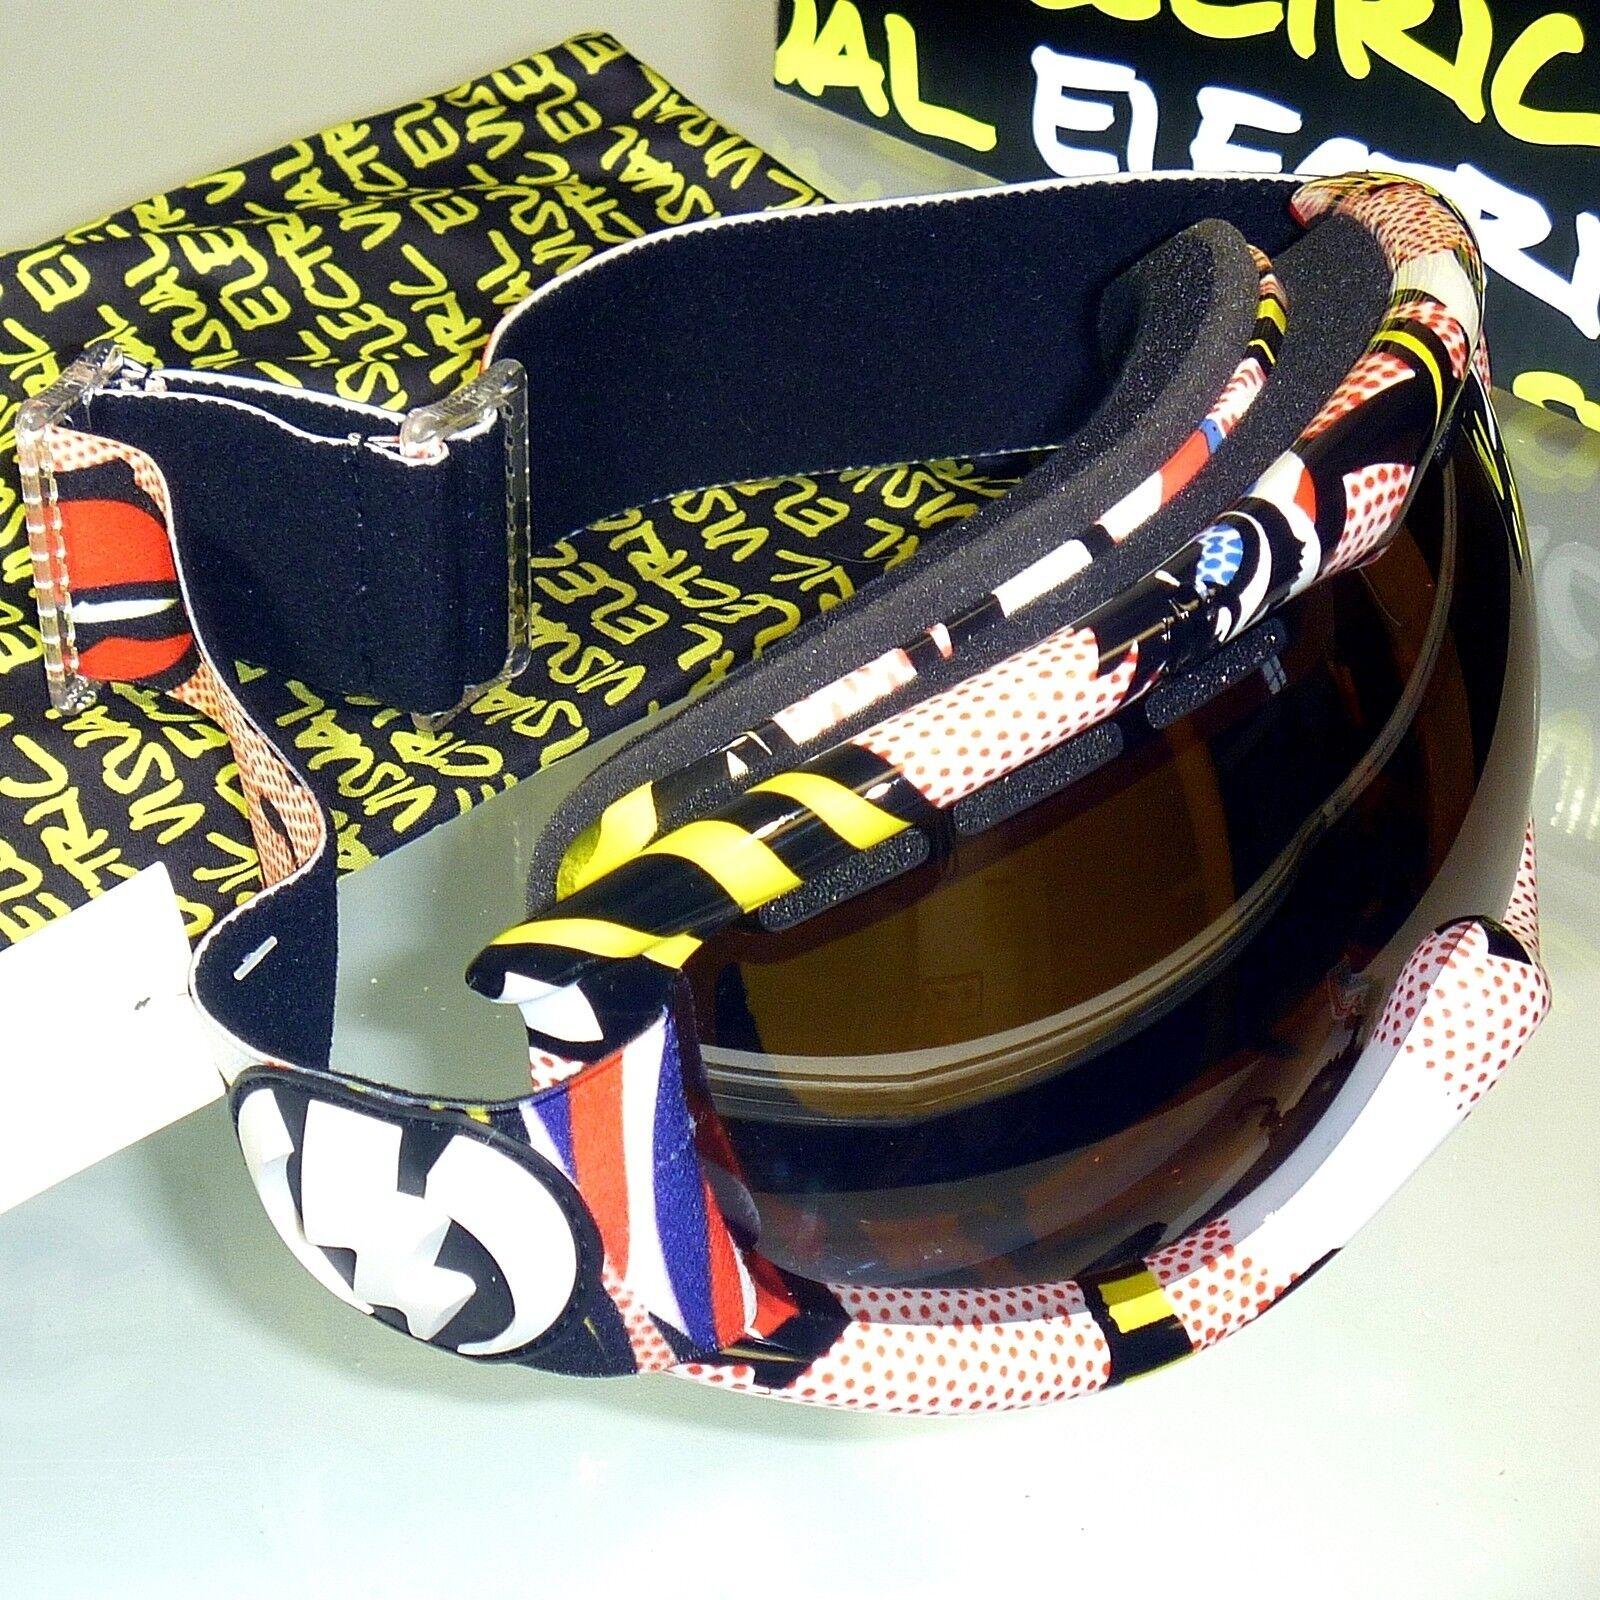 Electric Eg1s Nieve Goggles-Lips Marco   Bronce con Plateado Cromo